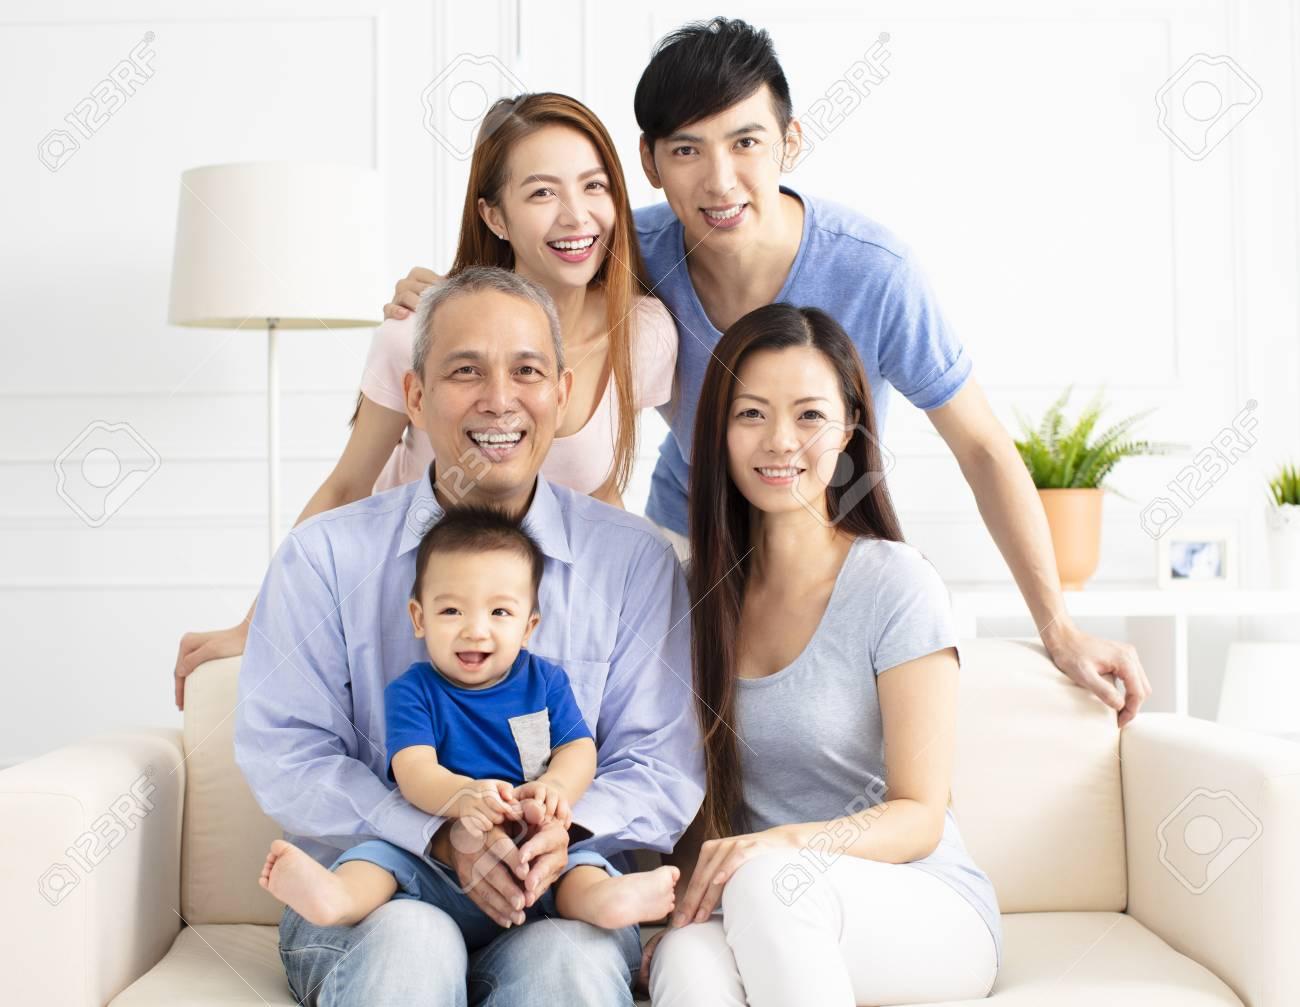 Portrait Of Three Generation asian Family - 104293720